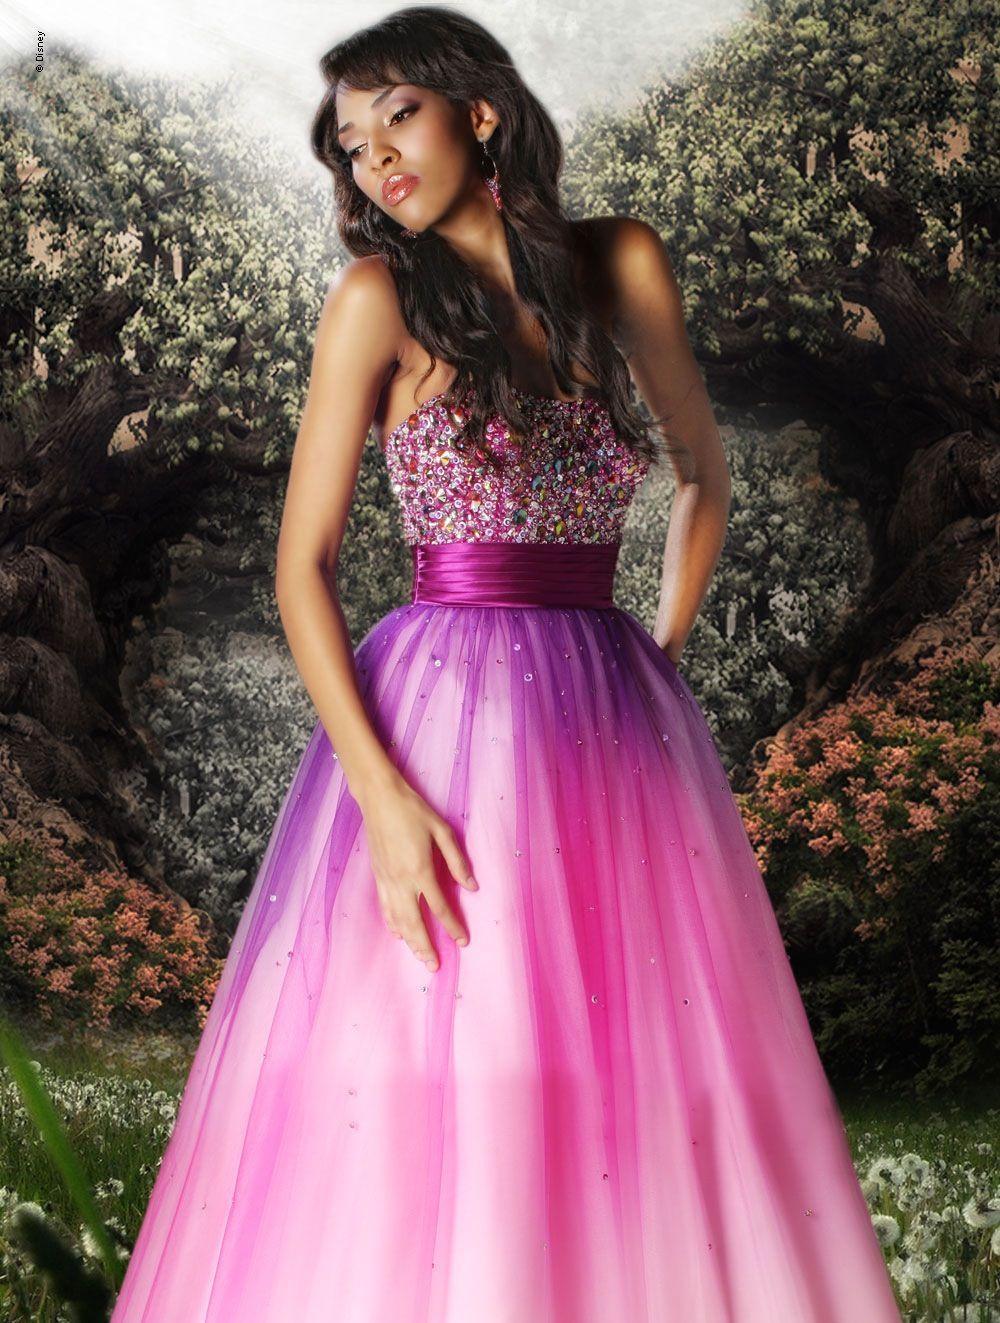 Forever Enchanted--Disney prom dress. My back-up dream dress. idk ...